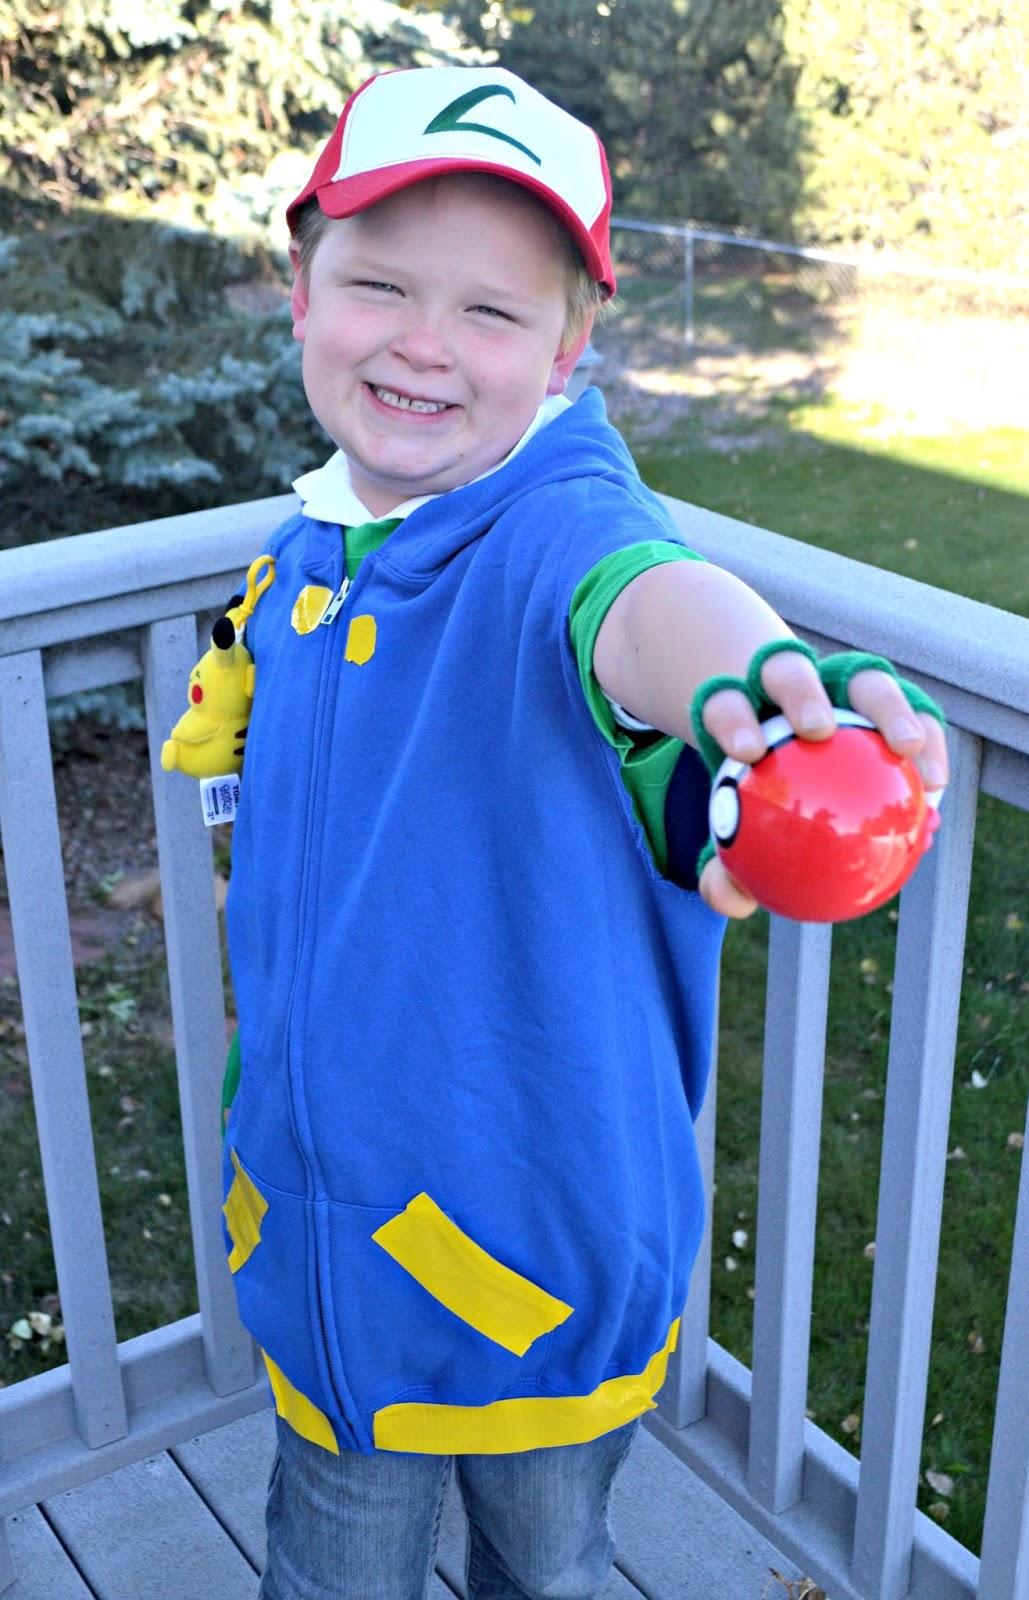 Ash ketchum pokemon diy halloween costume building our story ash ketchum pokemon diy halloween costume pokemon halloween costume ash ketchum halloween costume solutioingenieria Images